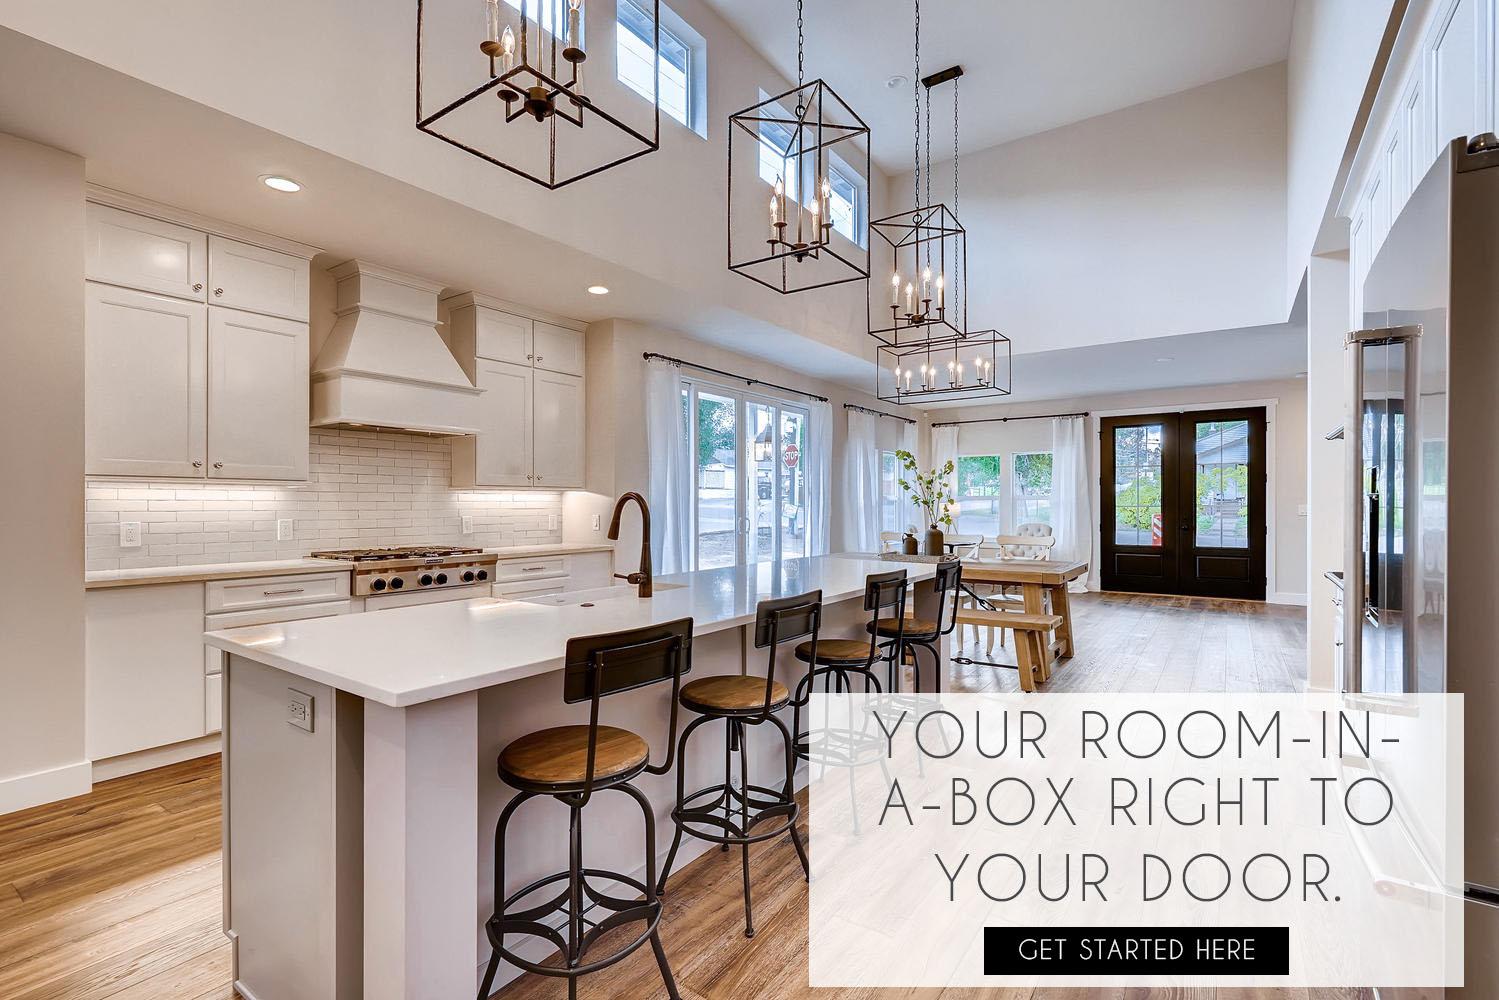 Postbox Designs Online Interior Design Services E Design